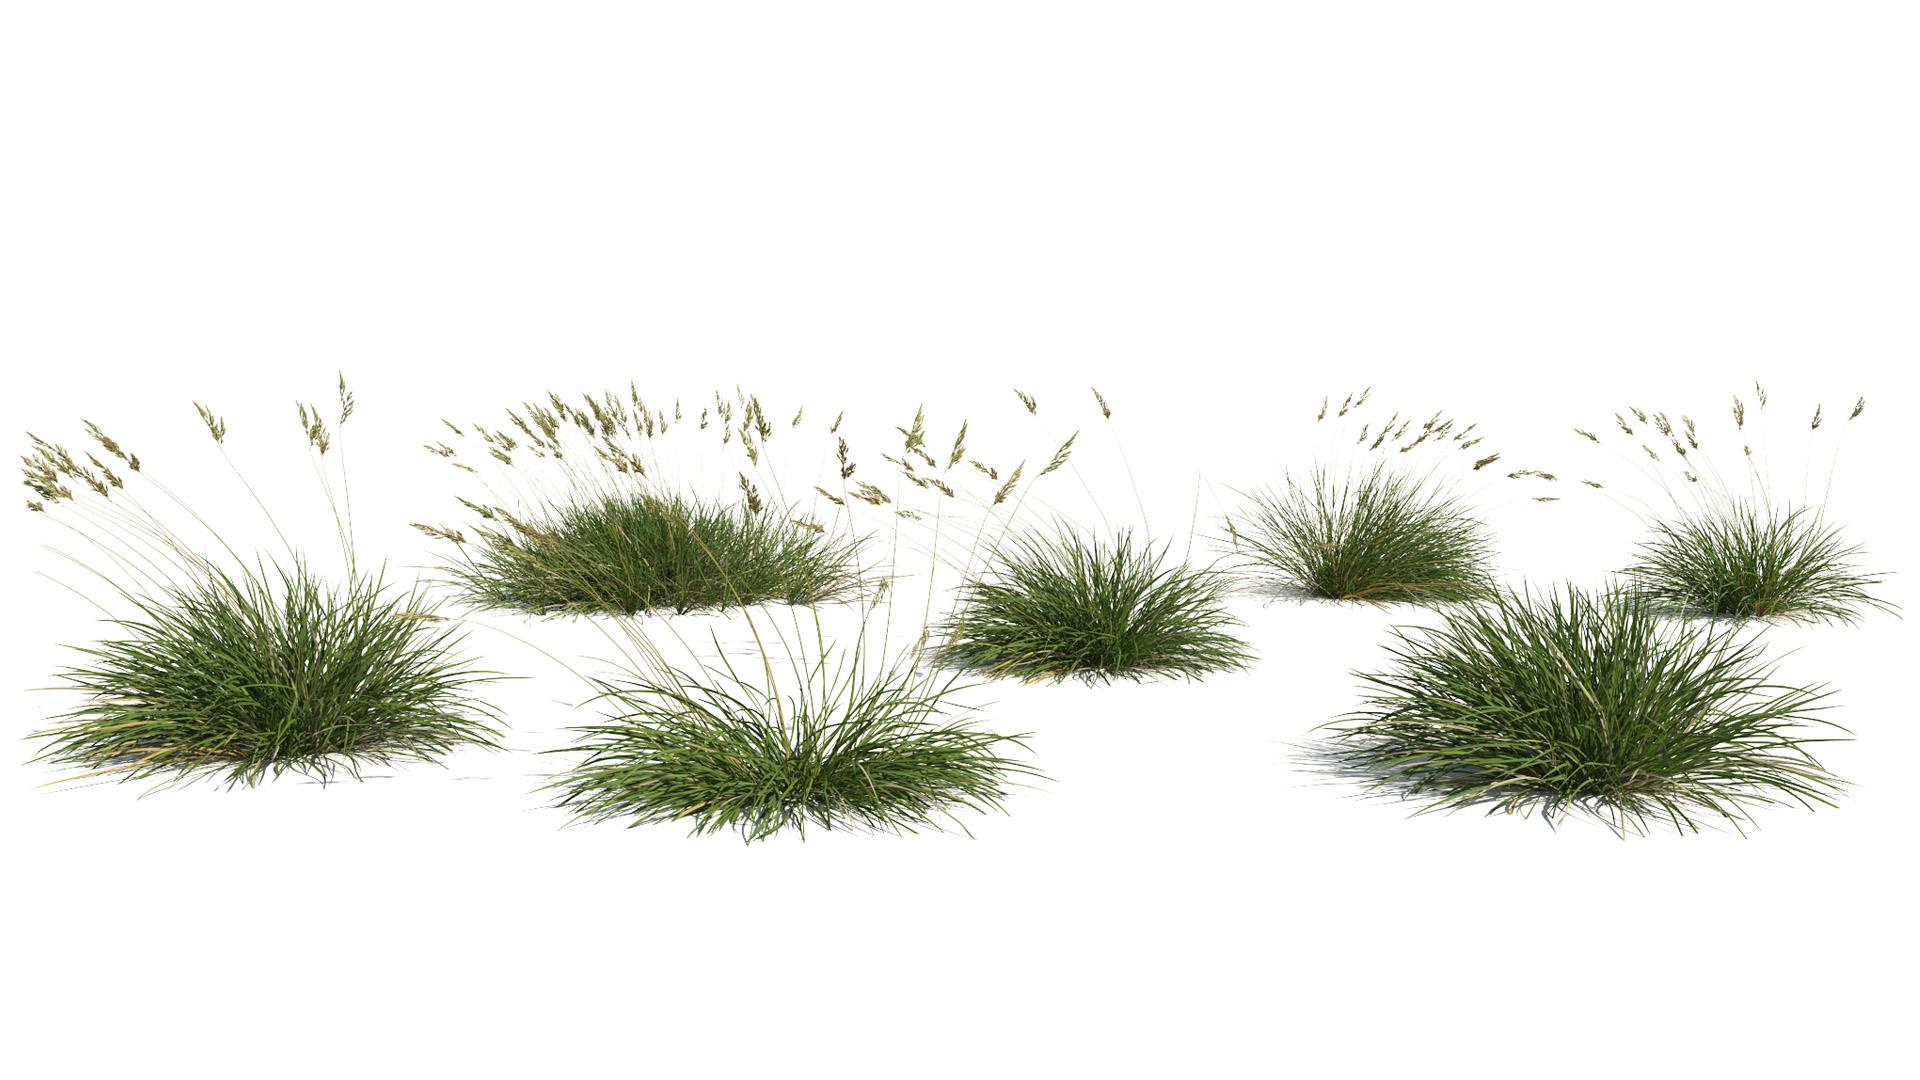 3D model of the Spiky fescue Festuca gautieri published parameters